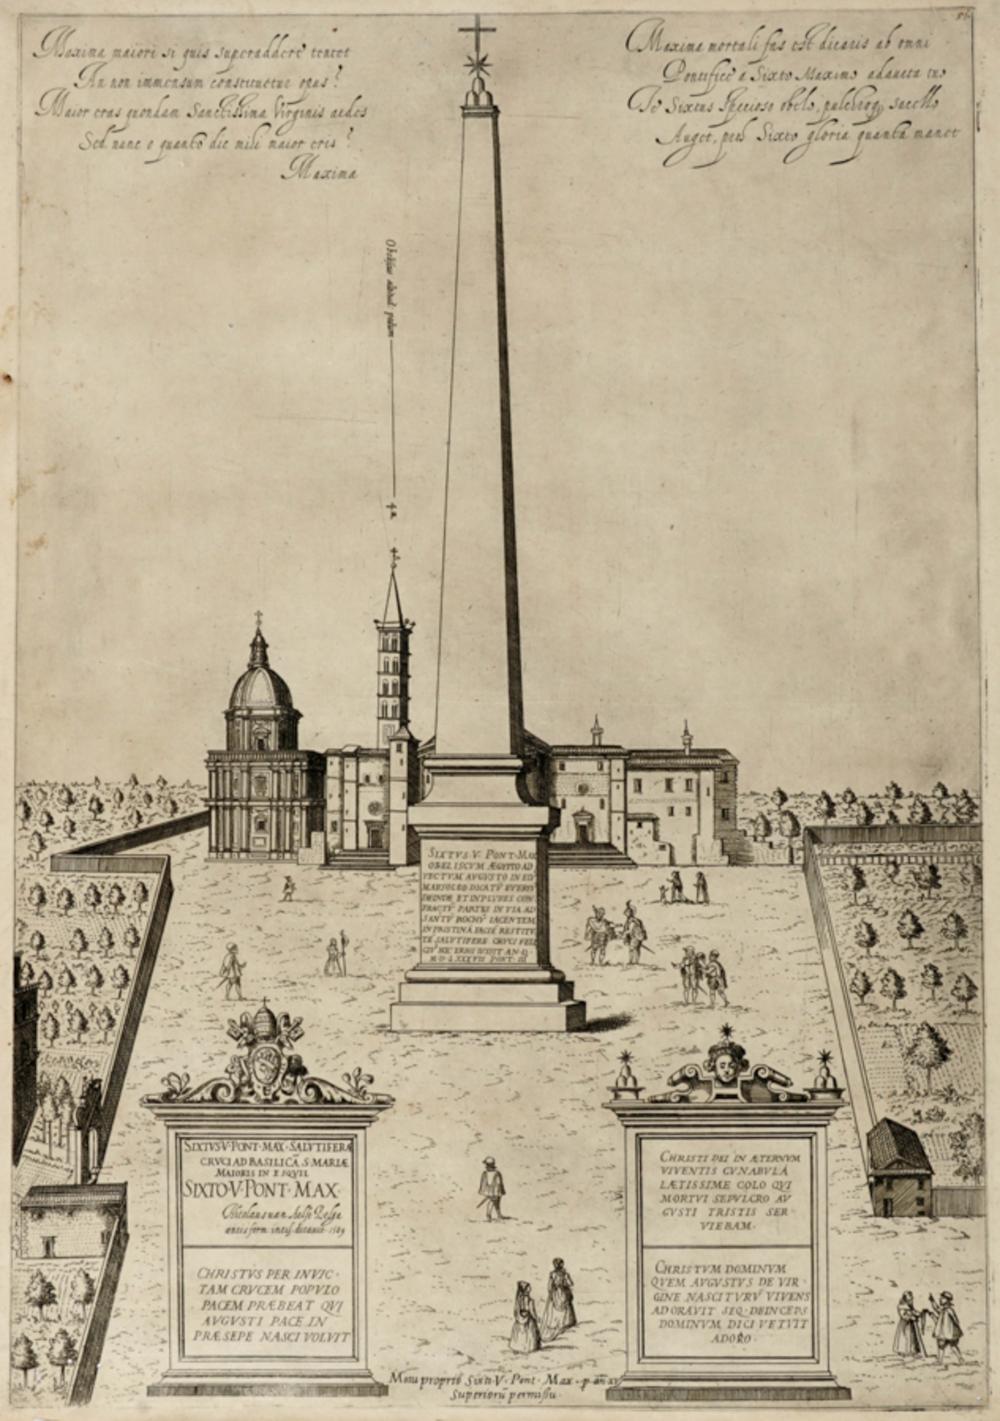 Anonimo del XVI secolo, Sixtus V Pont. Max. Obeliscum Aegypto ad vectum Augusto in eius mausoleo...